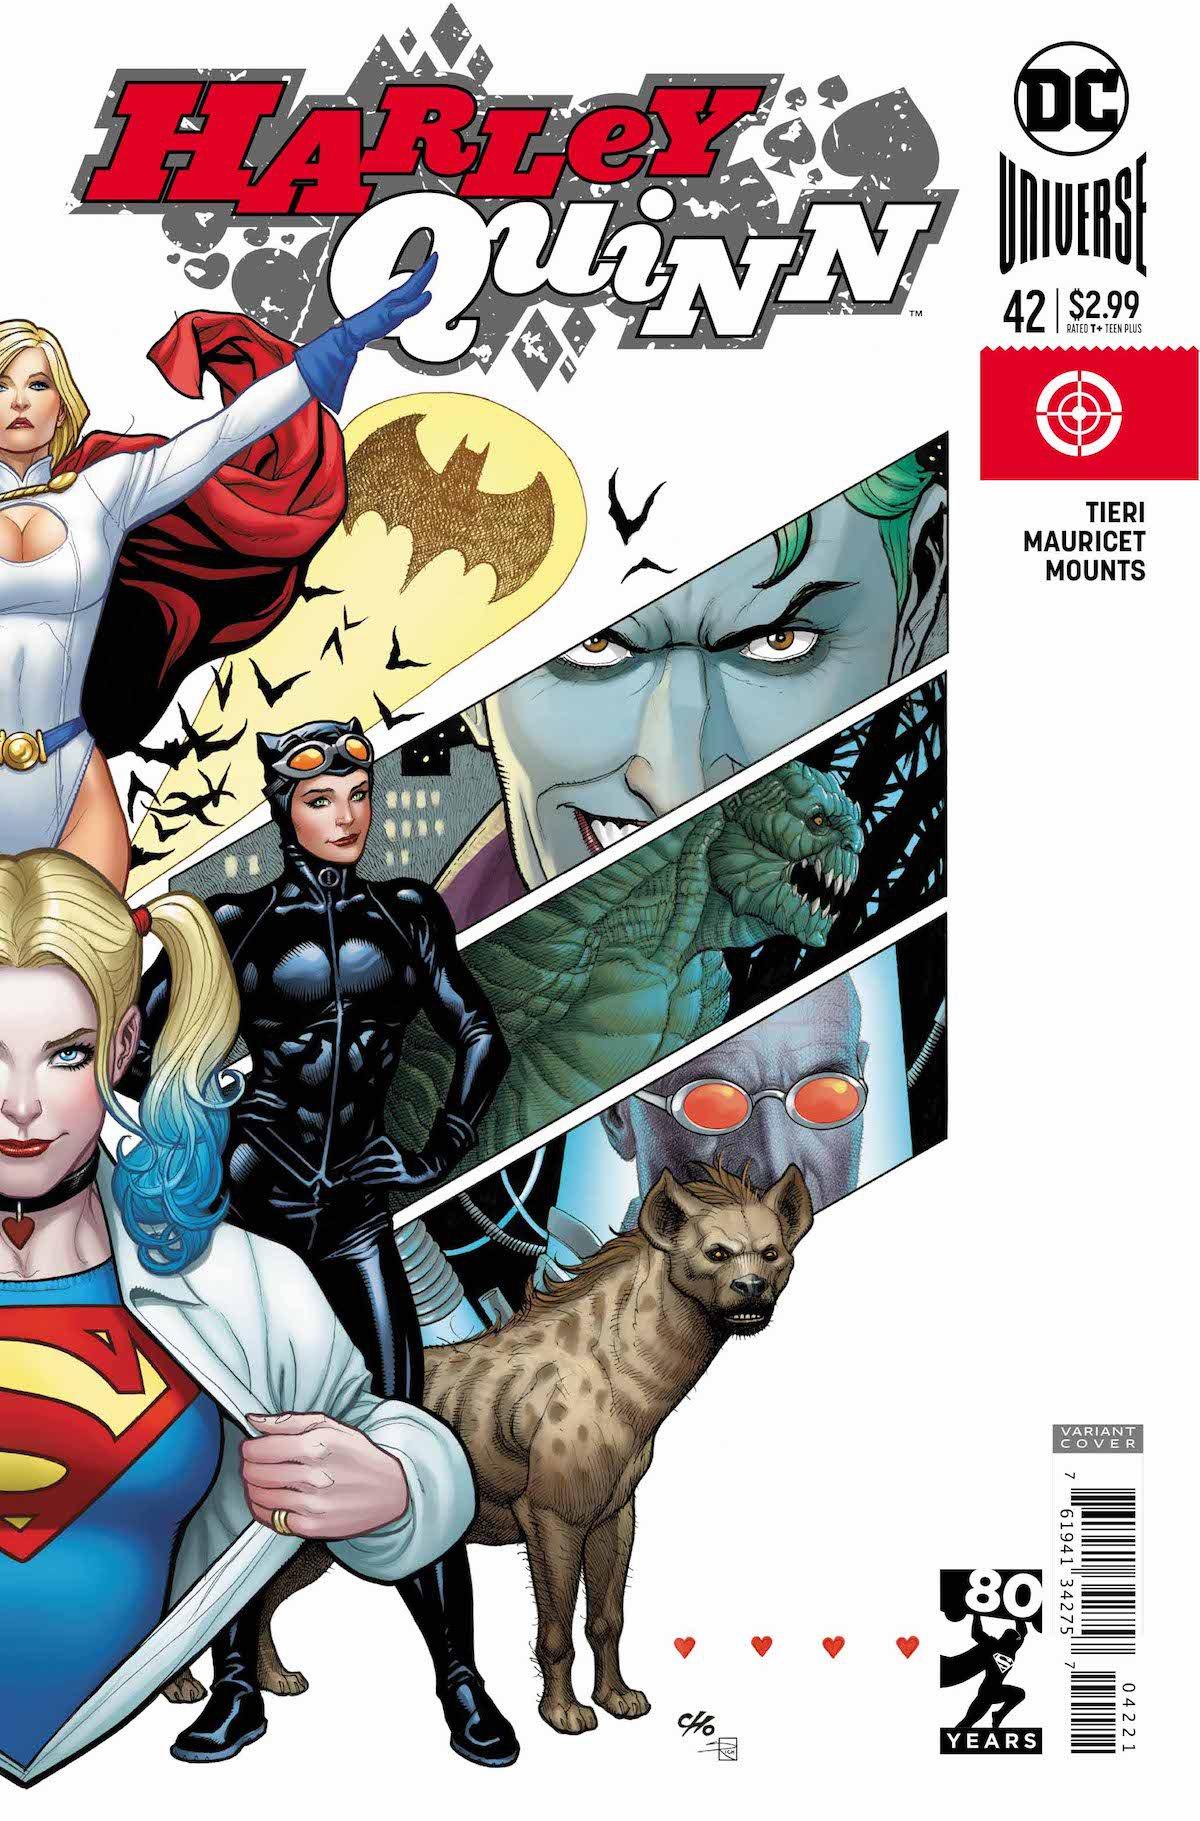 Harley Quinn #42 Superman variant cover